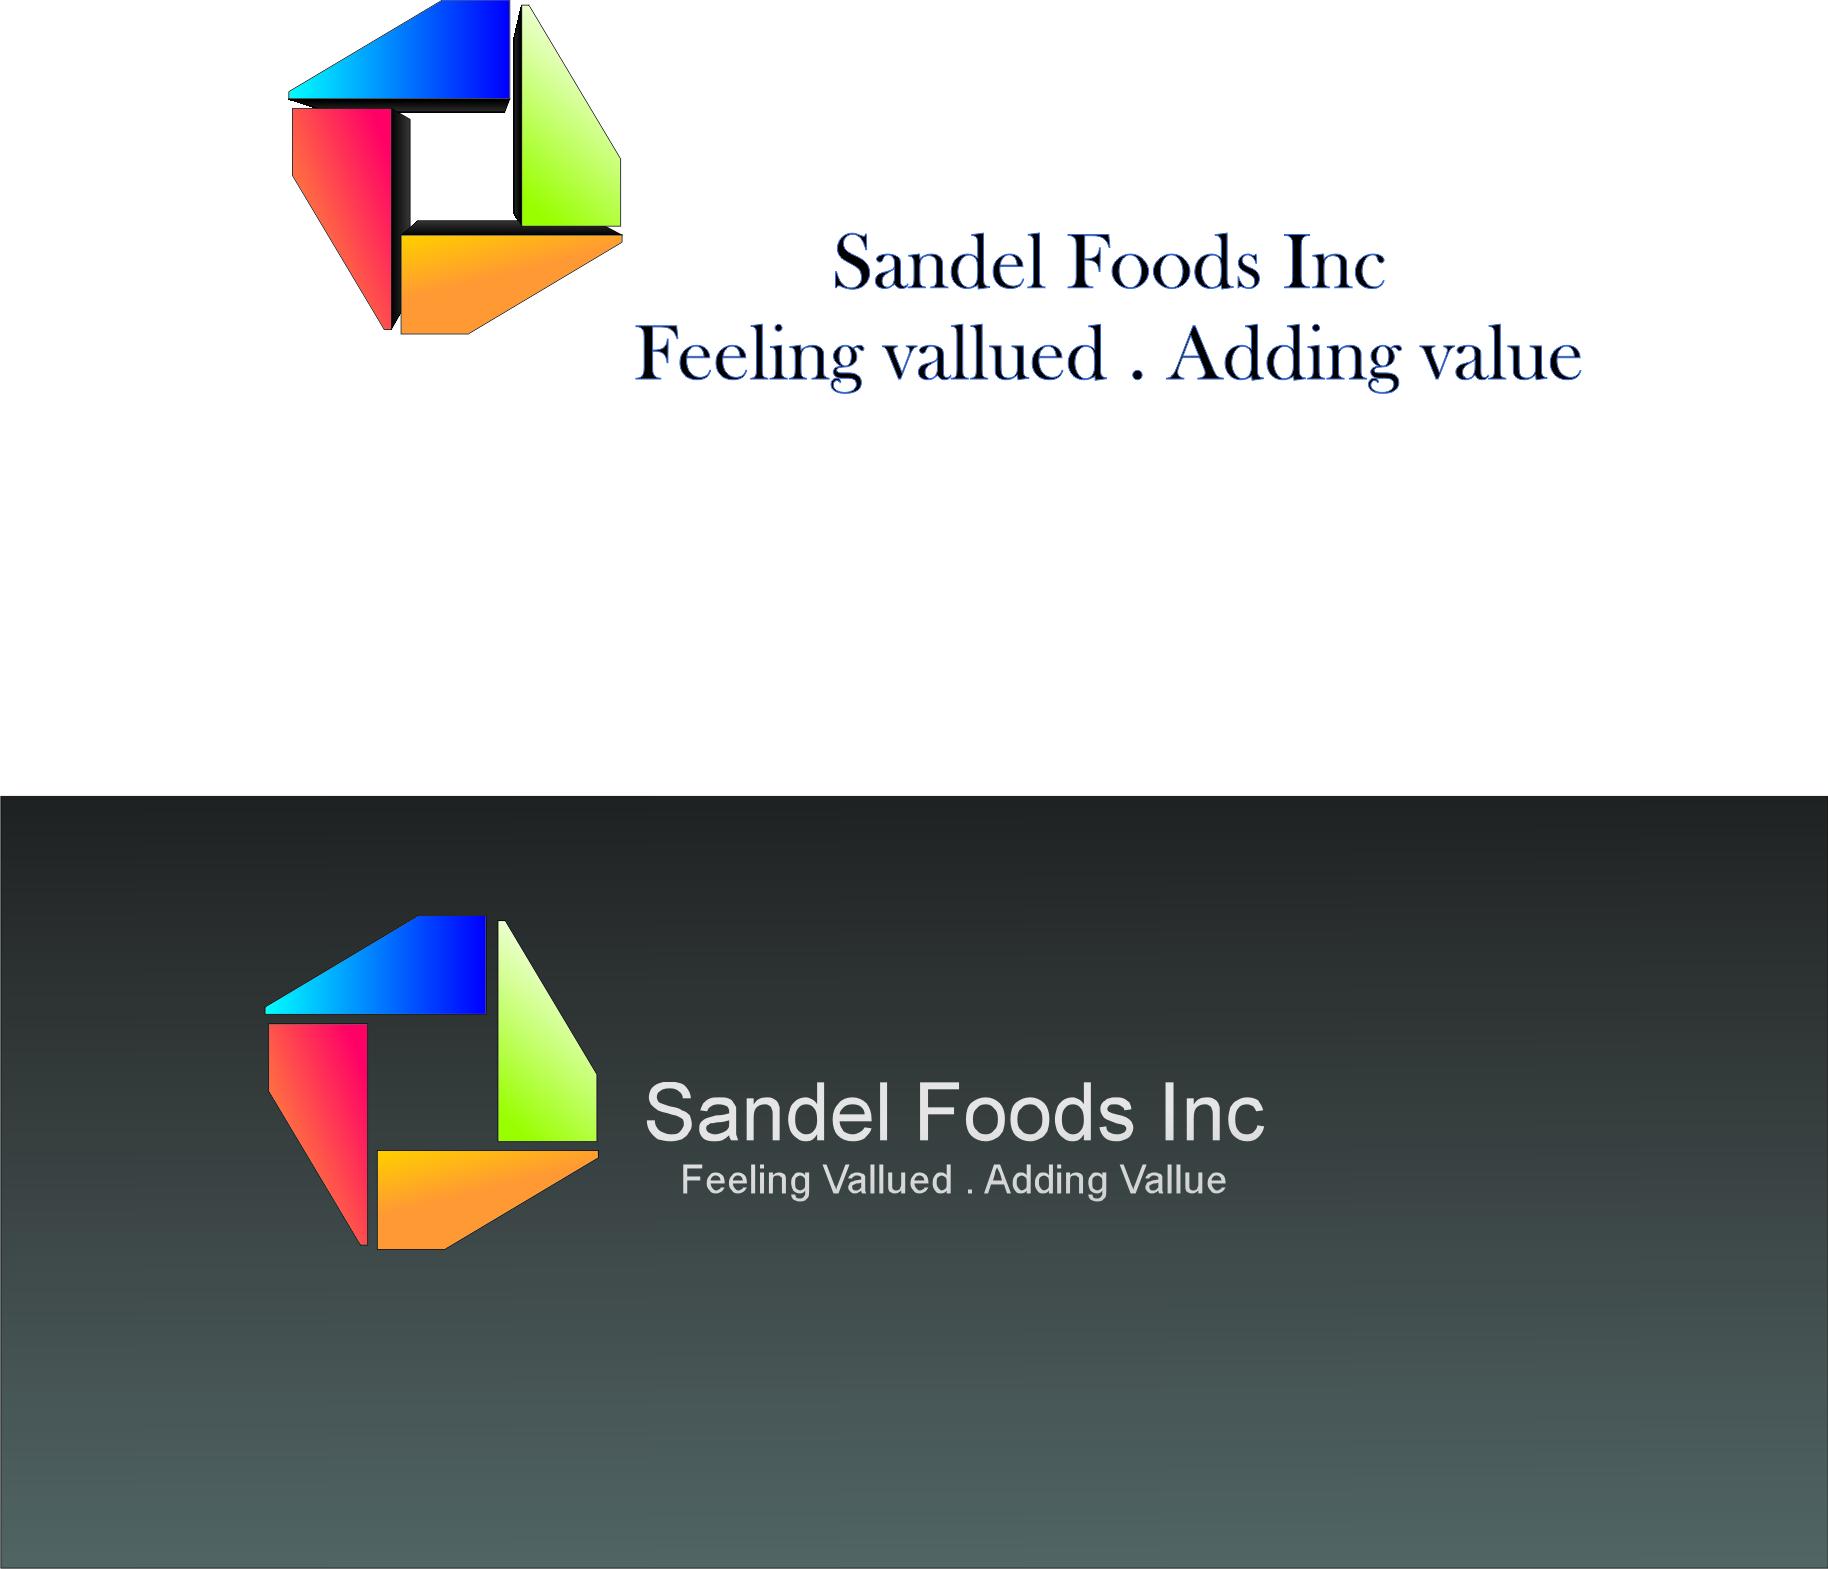 Logo Design by dimitrovart - Entry No. 18 in the Logo Design Contest Fun Logo Design for Sandel Foods Inc.